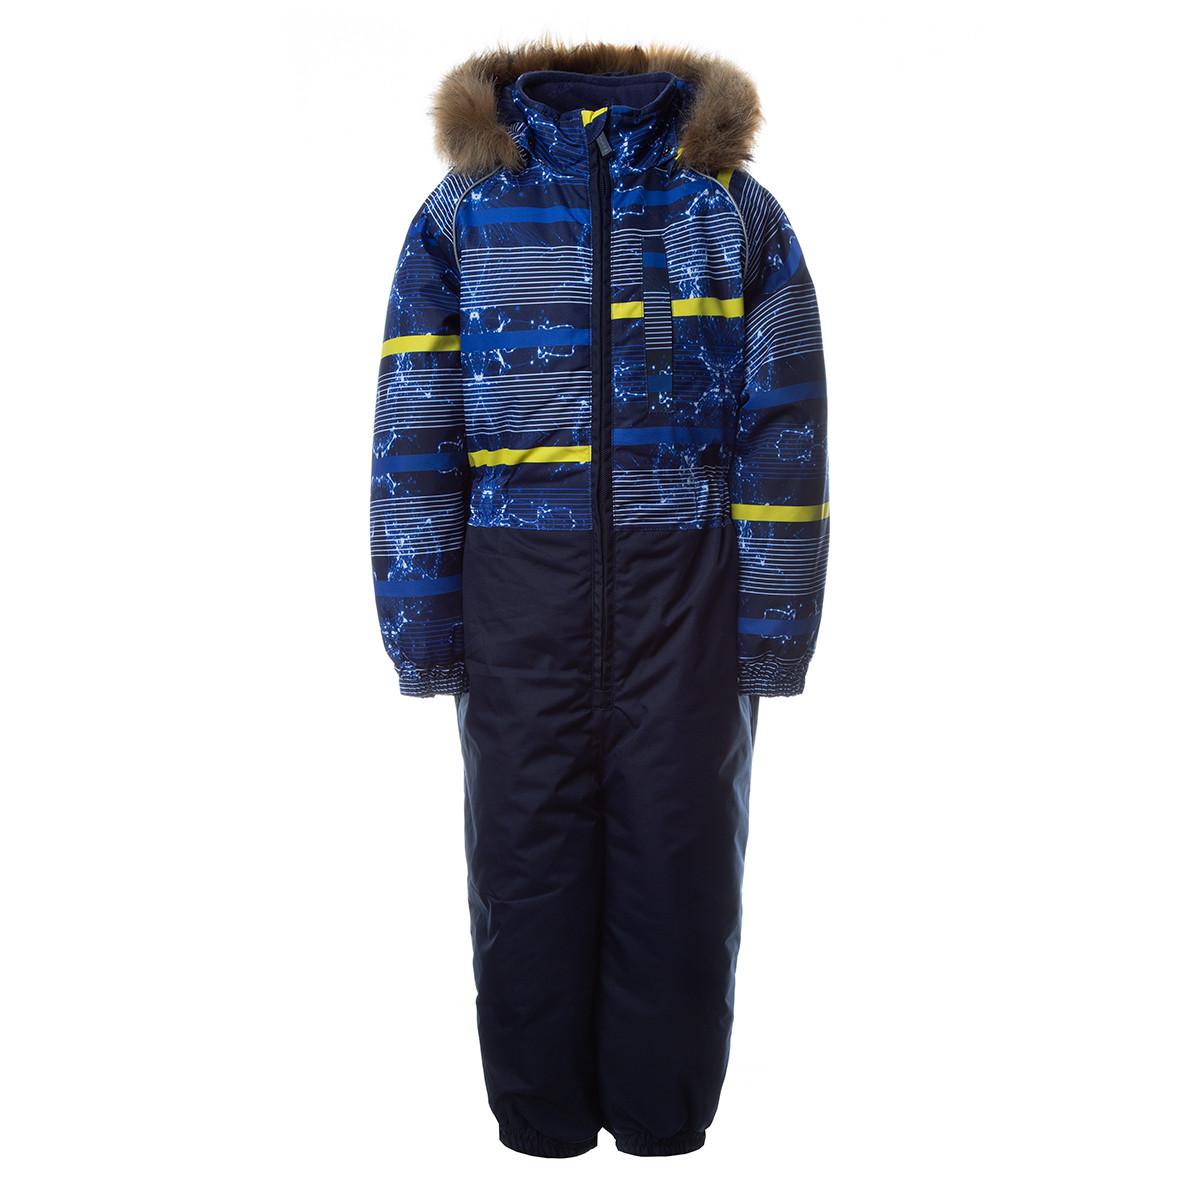 Детский комбинезон Huppa WILLY,  тёмно-синий с принтом/тёмно-синий